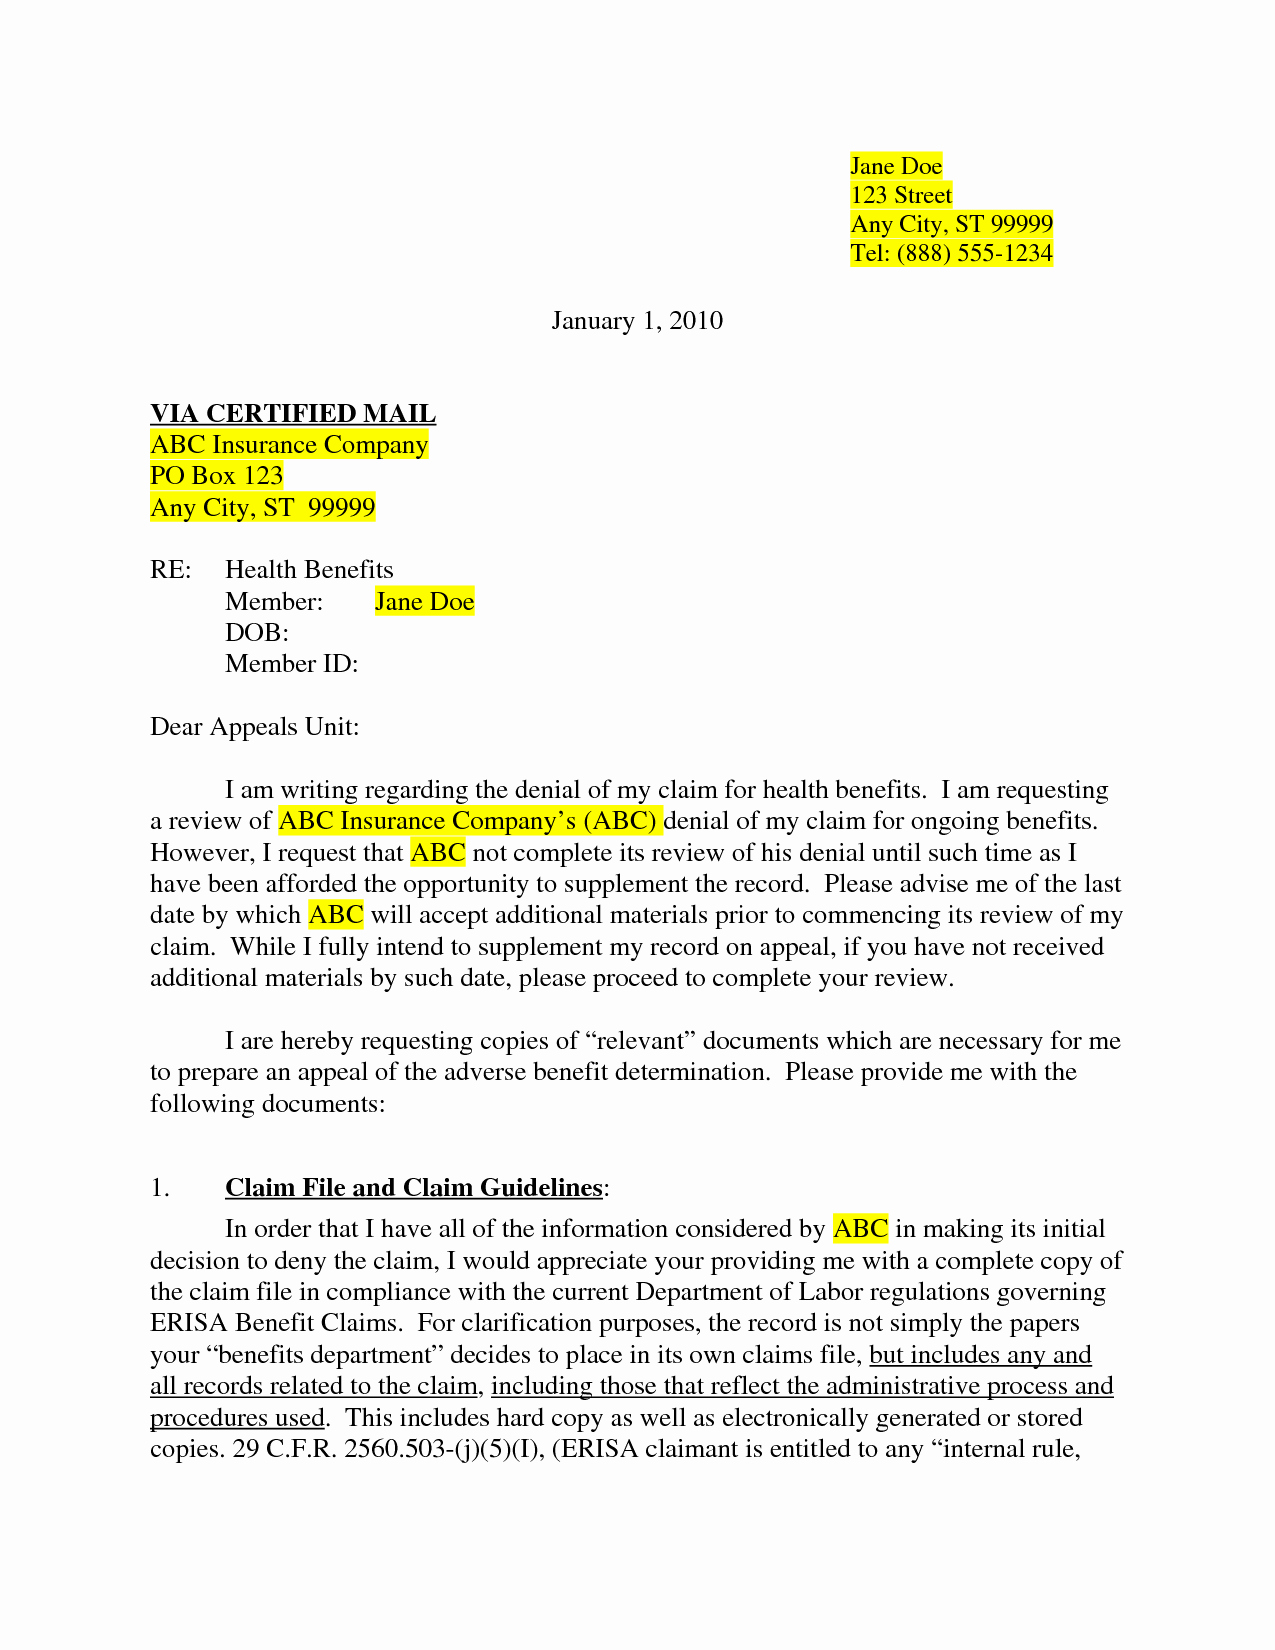 Insurance Appeal Letter Samples New Best S Of Medical Claim Appeal Letter Sample